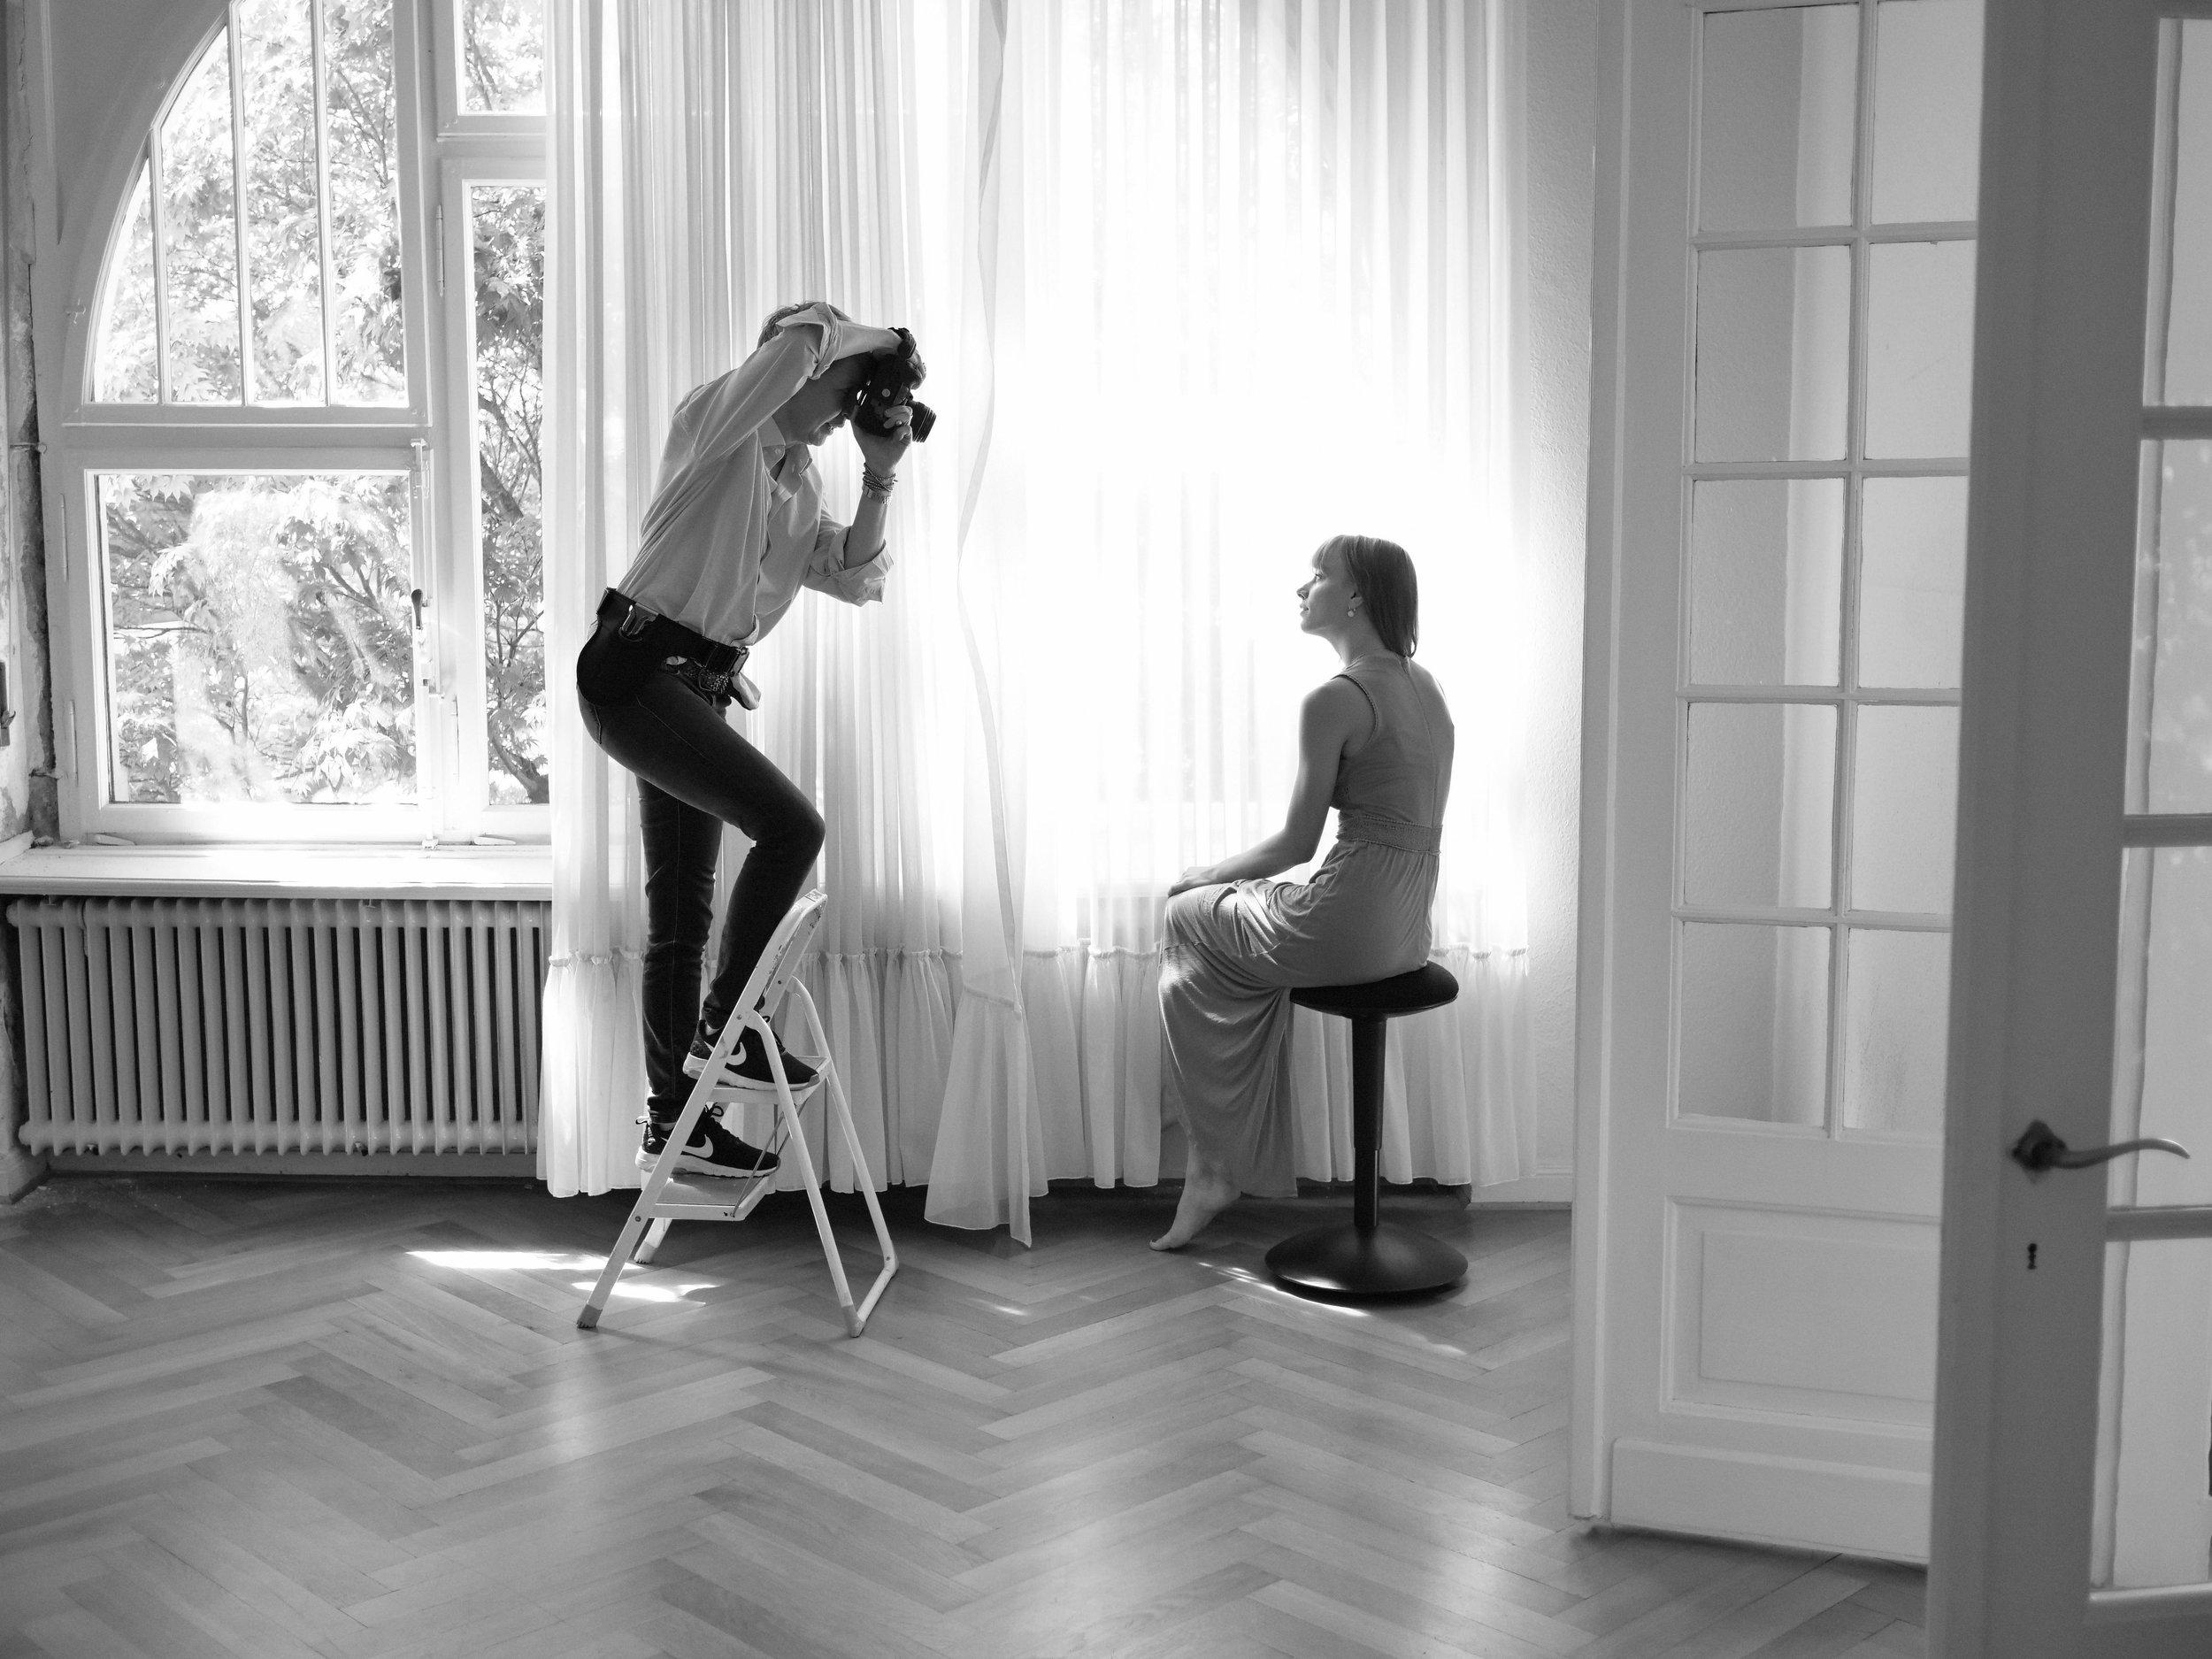 P1022368_Exp Fotografie Workshop Bonn Portraitfotografie.jpg